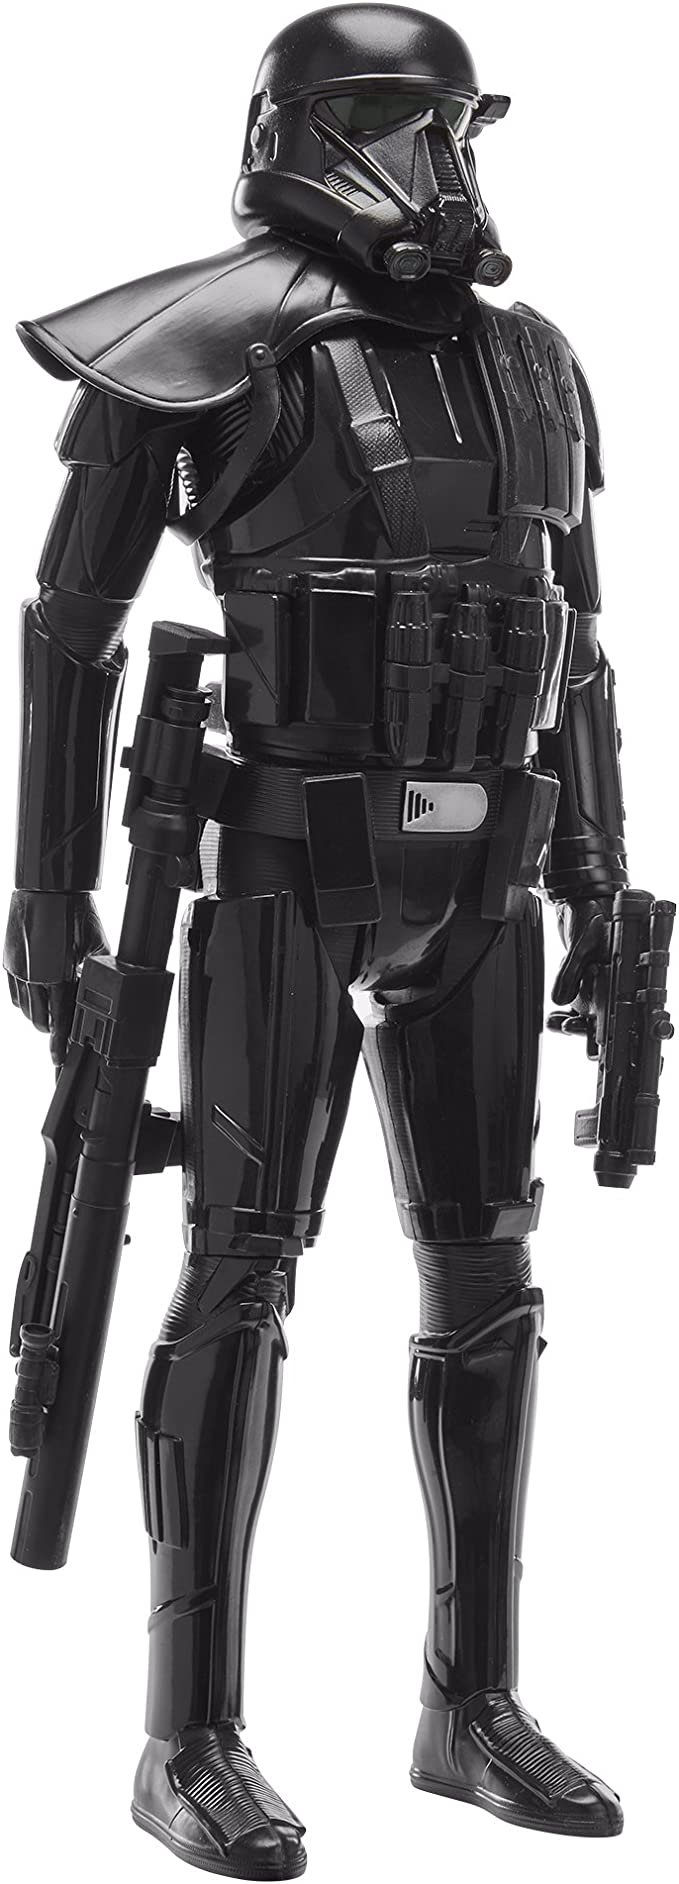 DEATH TROOPER Rogue One Actionfigur Jakks Pacific 01767 Disney Star Wars